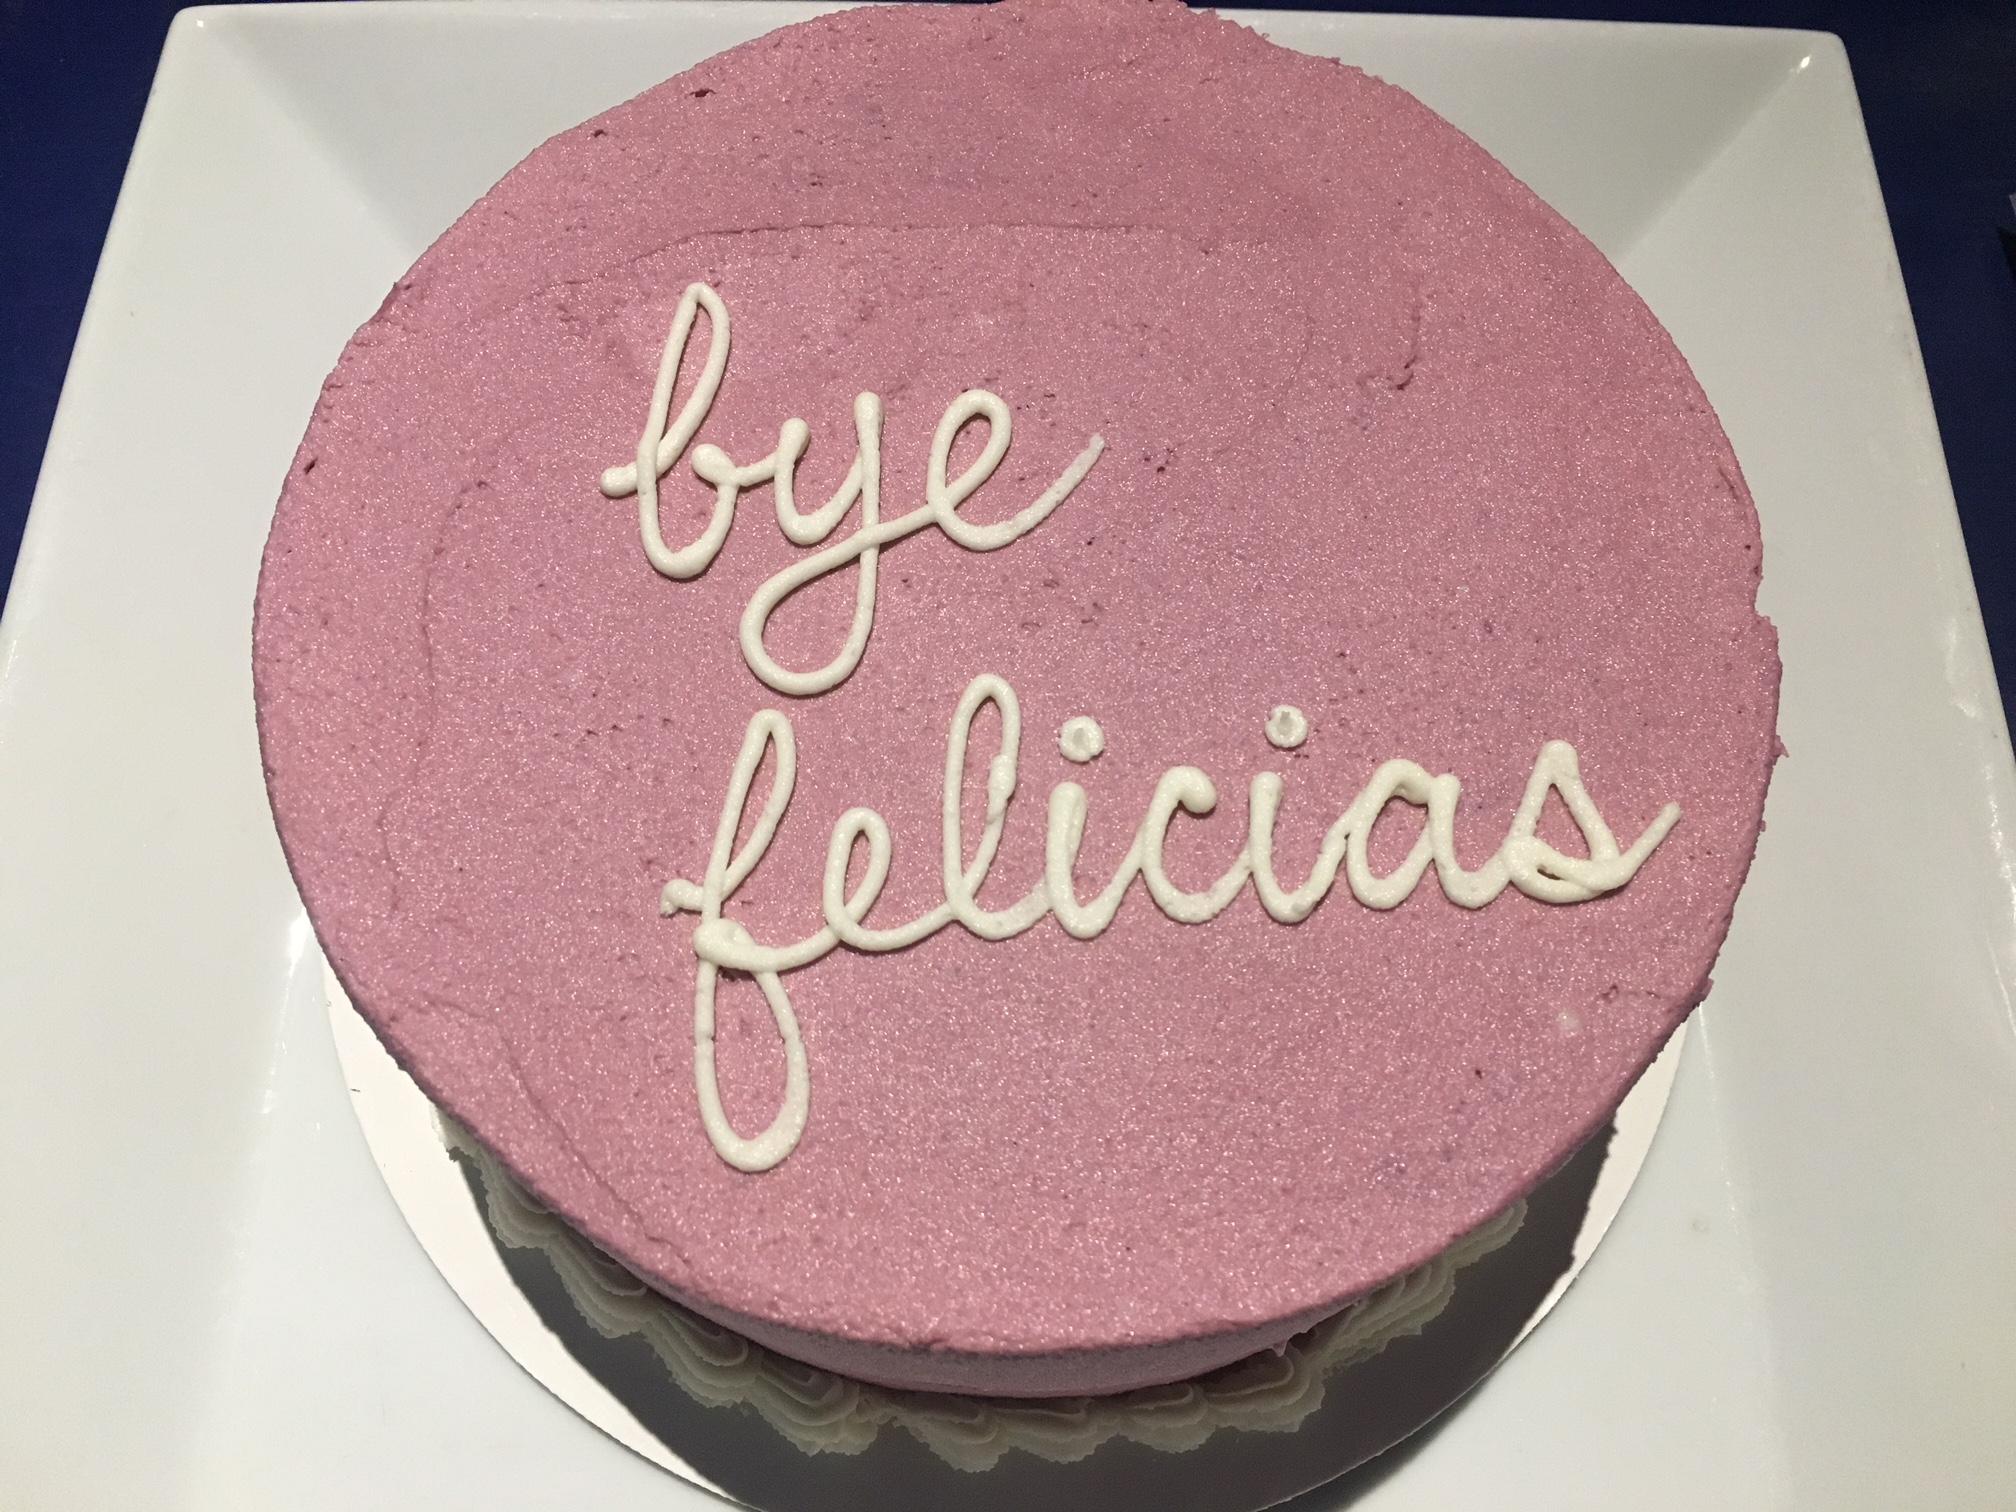 Cake - Bye Felicias.JPG